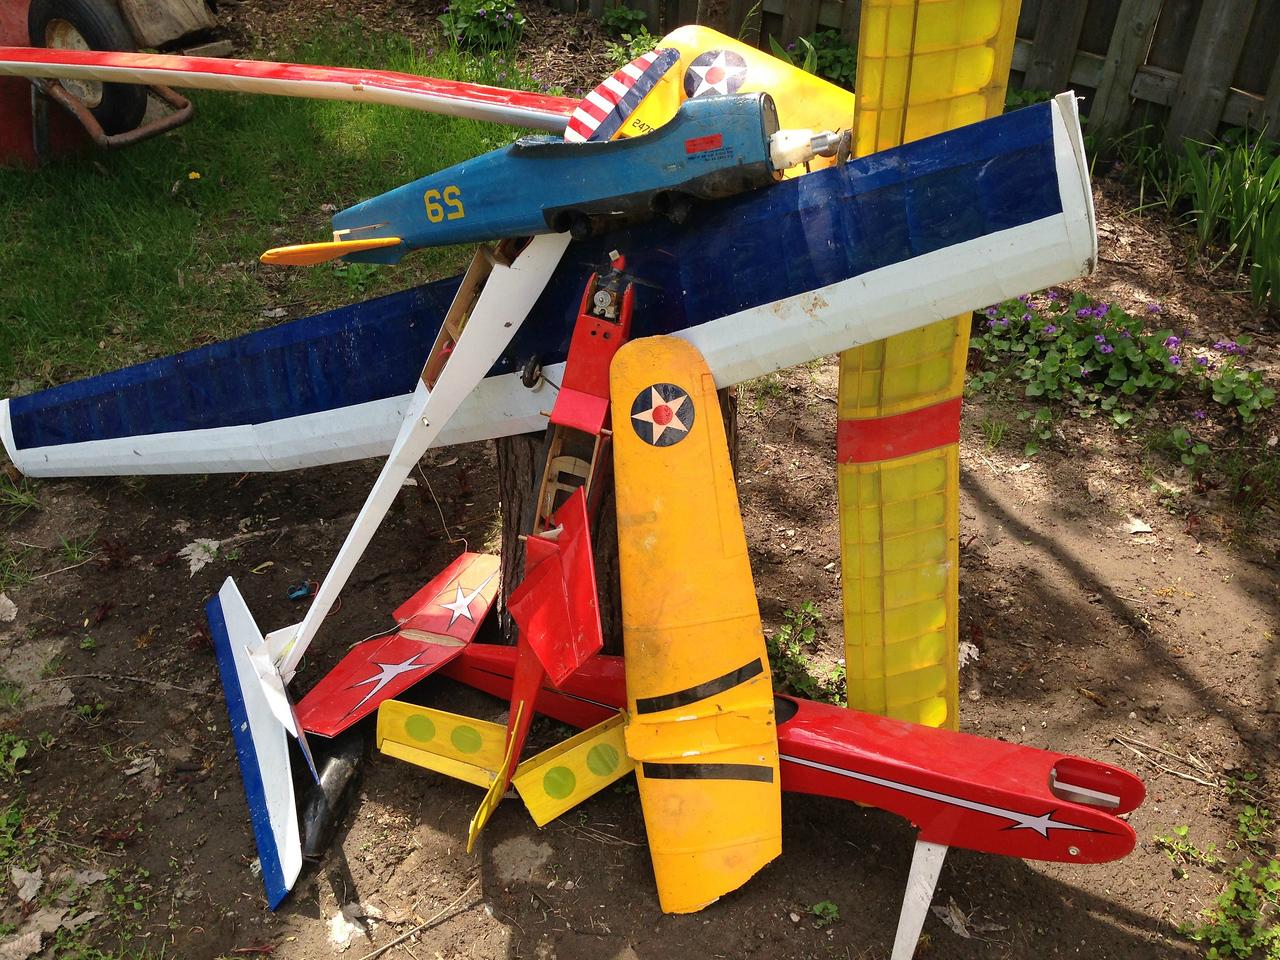 May 23 Model airplanes